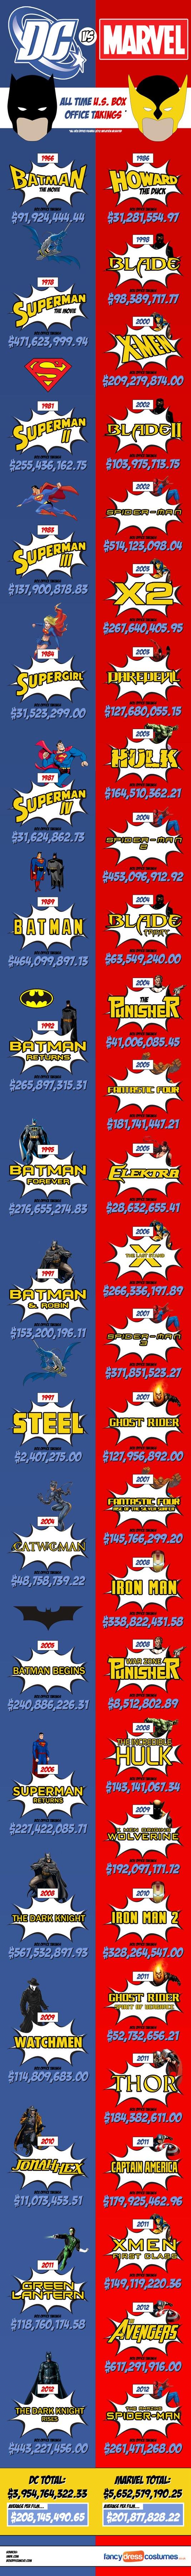 Marvel Vs. DC Infographic